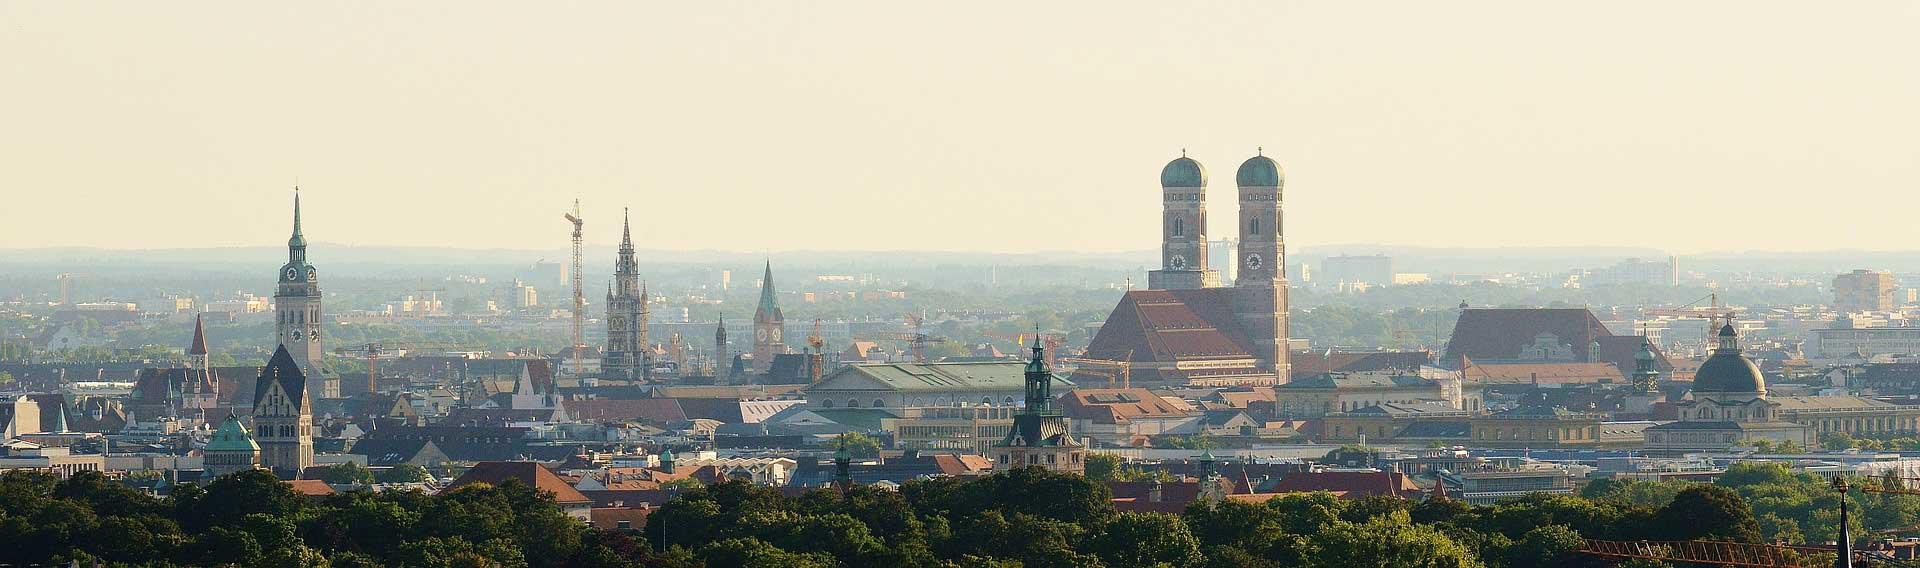 Landingpage erstellen lassen München